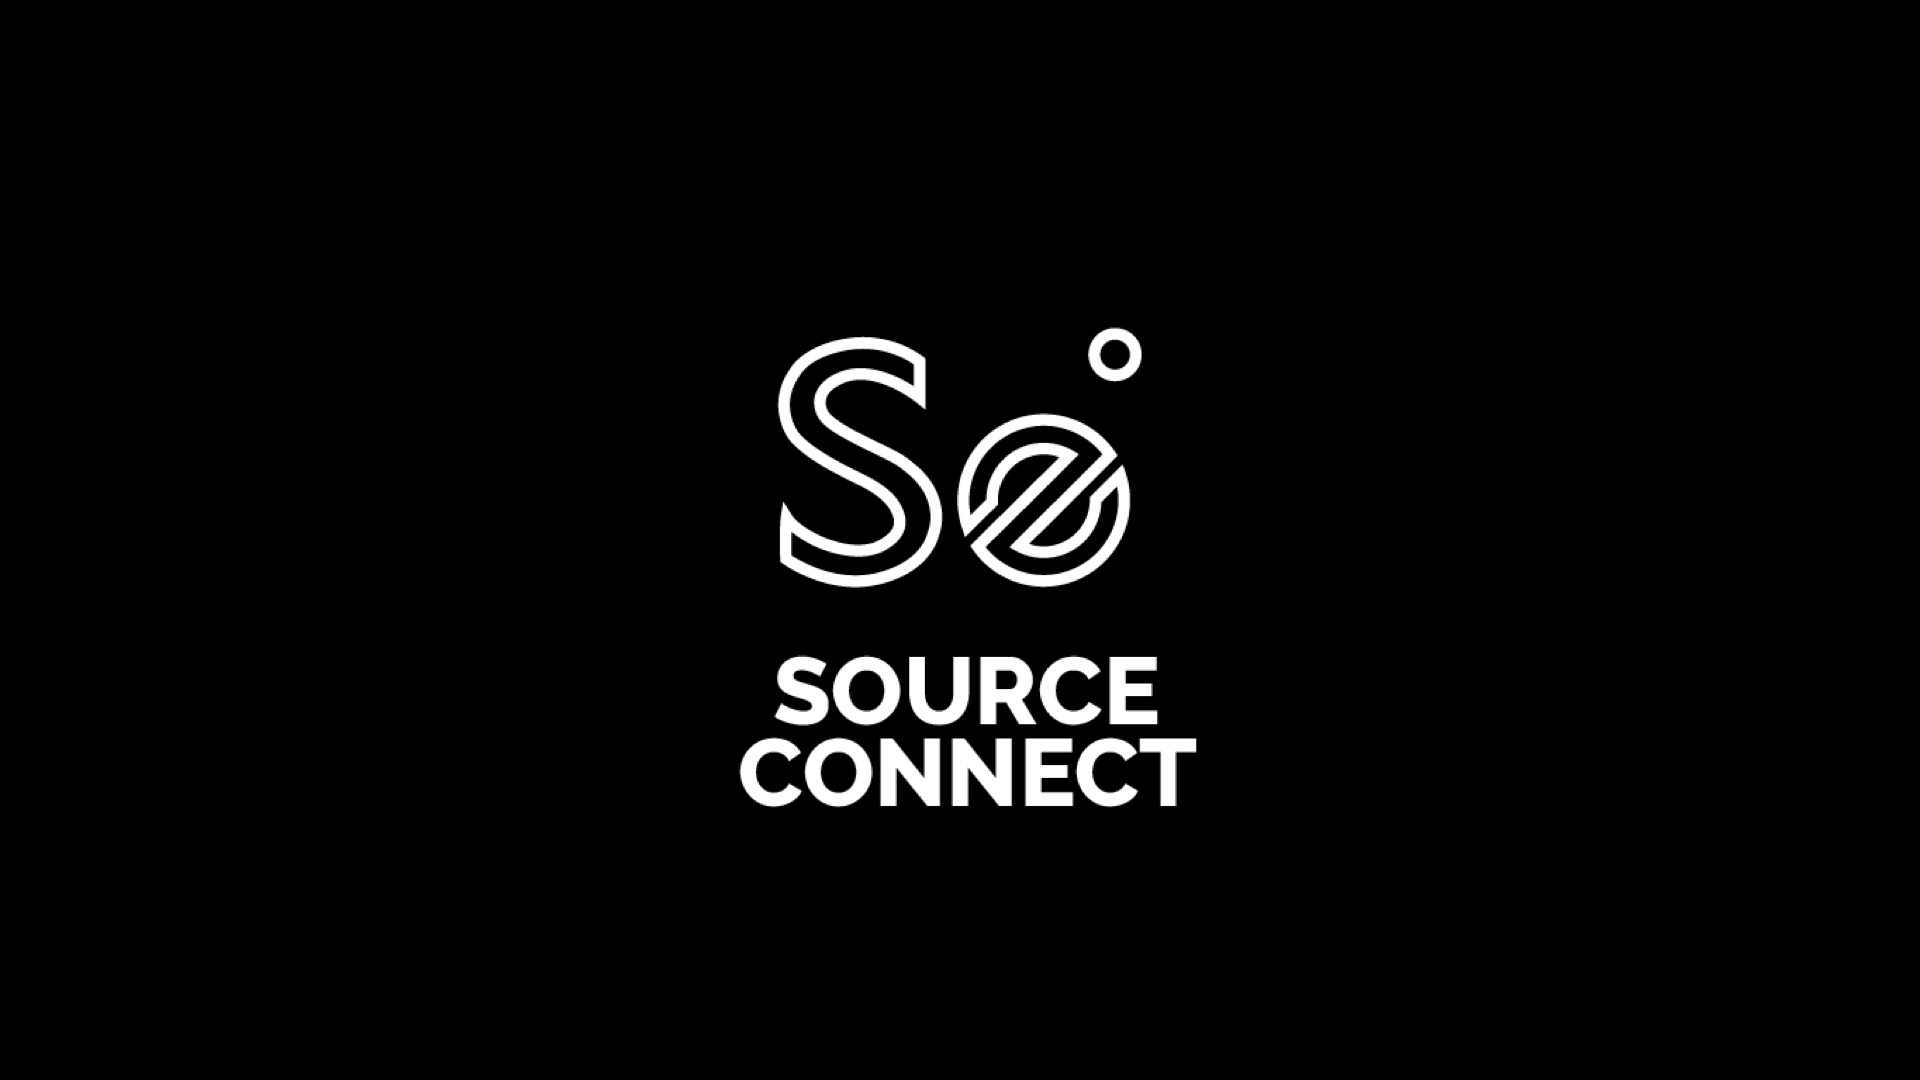 Source Connect SubCat Studios